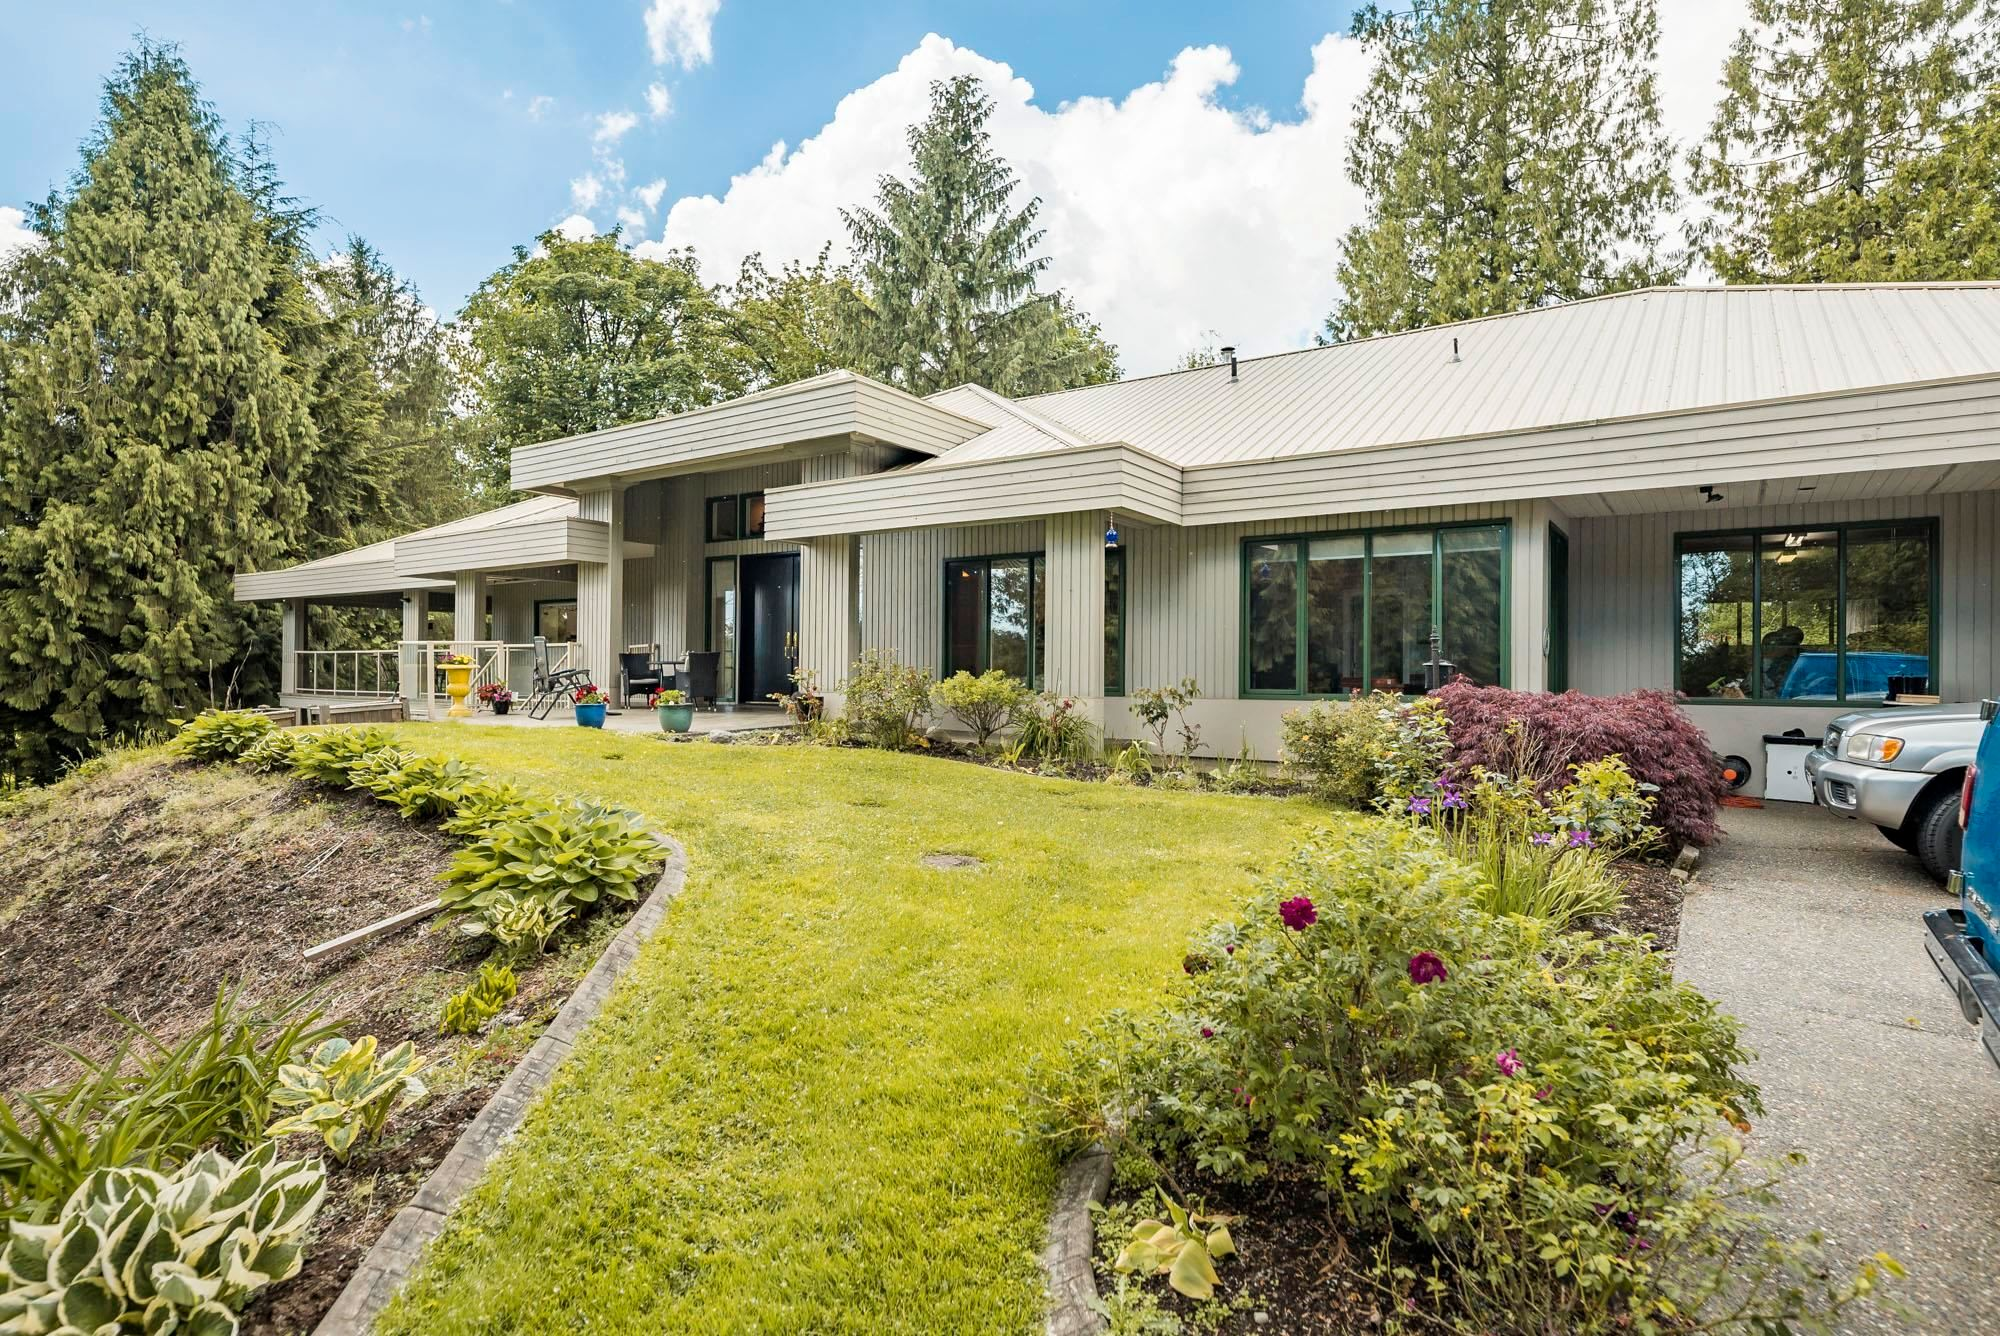 Main Photo: 17077 92 Avenue in Surrey: Fleetwood Tynehead House for sale : MLS®# R2618858